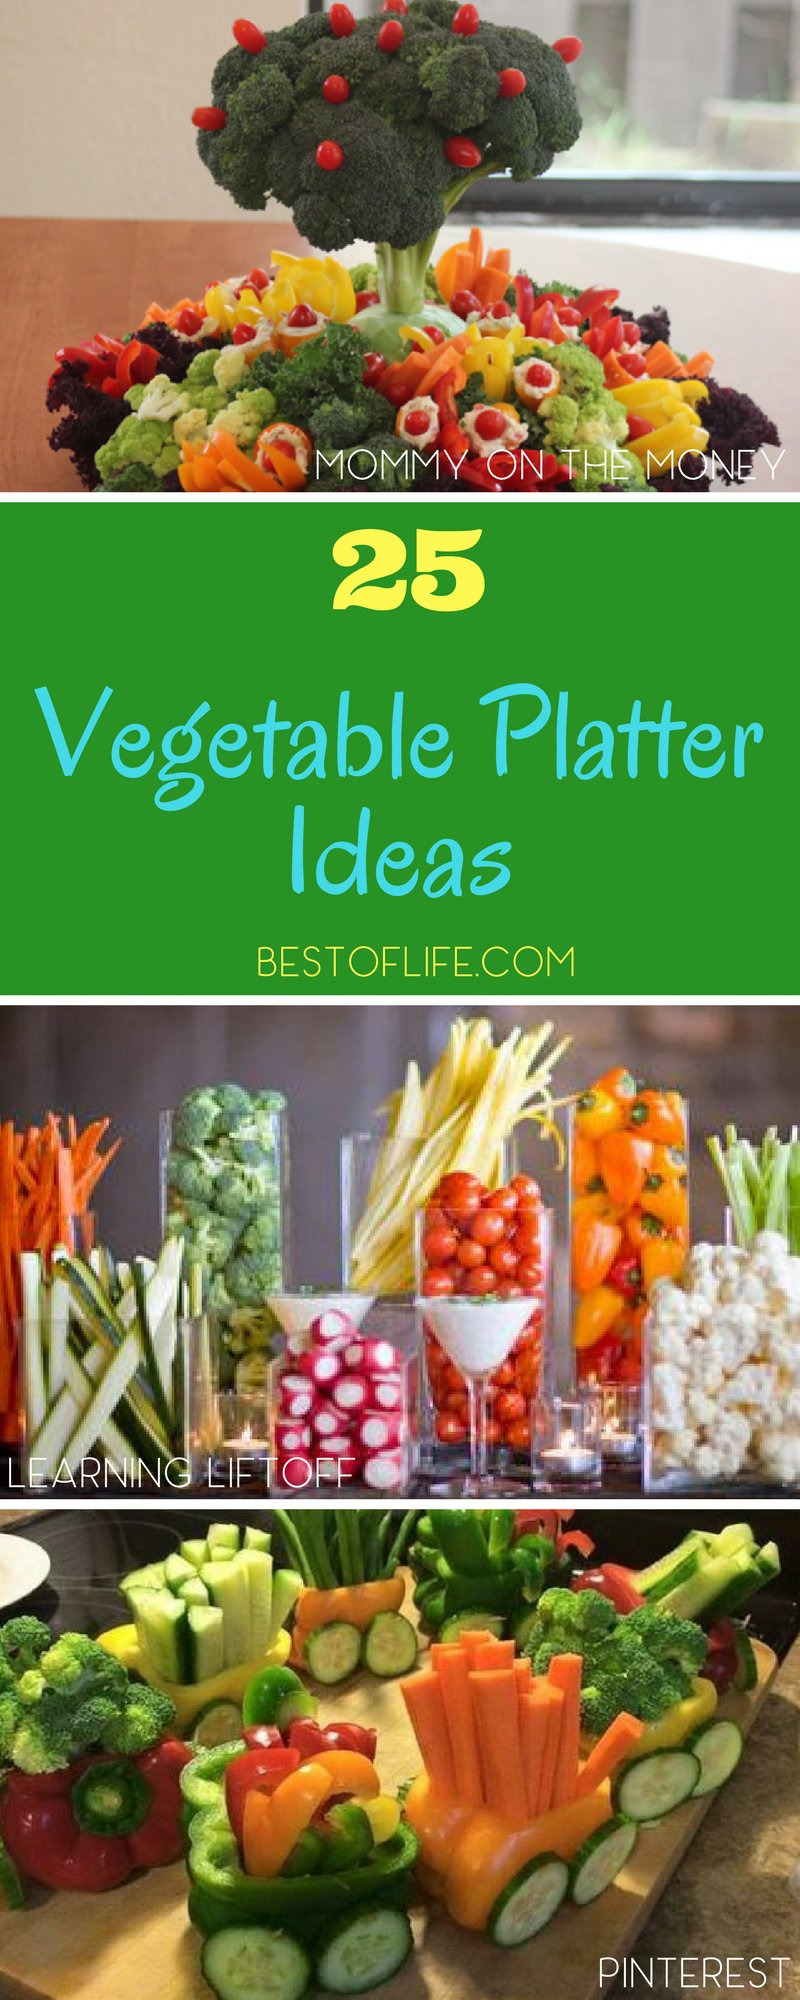 25 vegetable platter ideas for parties